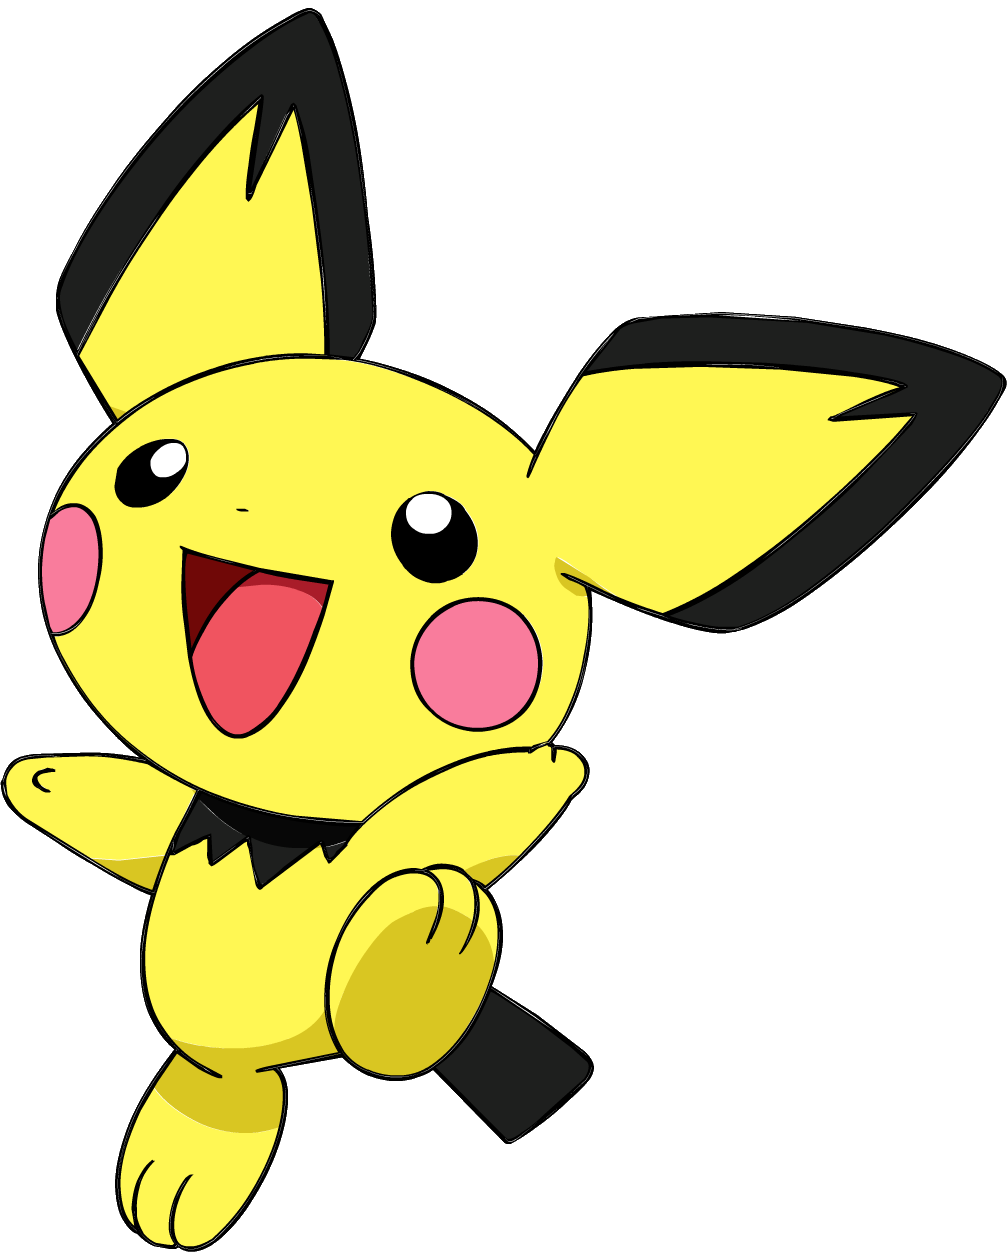 Image 172pichu Os Anime 3 Png Pok 233 Mon Wiki Fandom Powered By Wikia